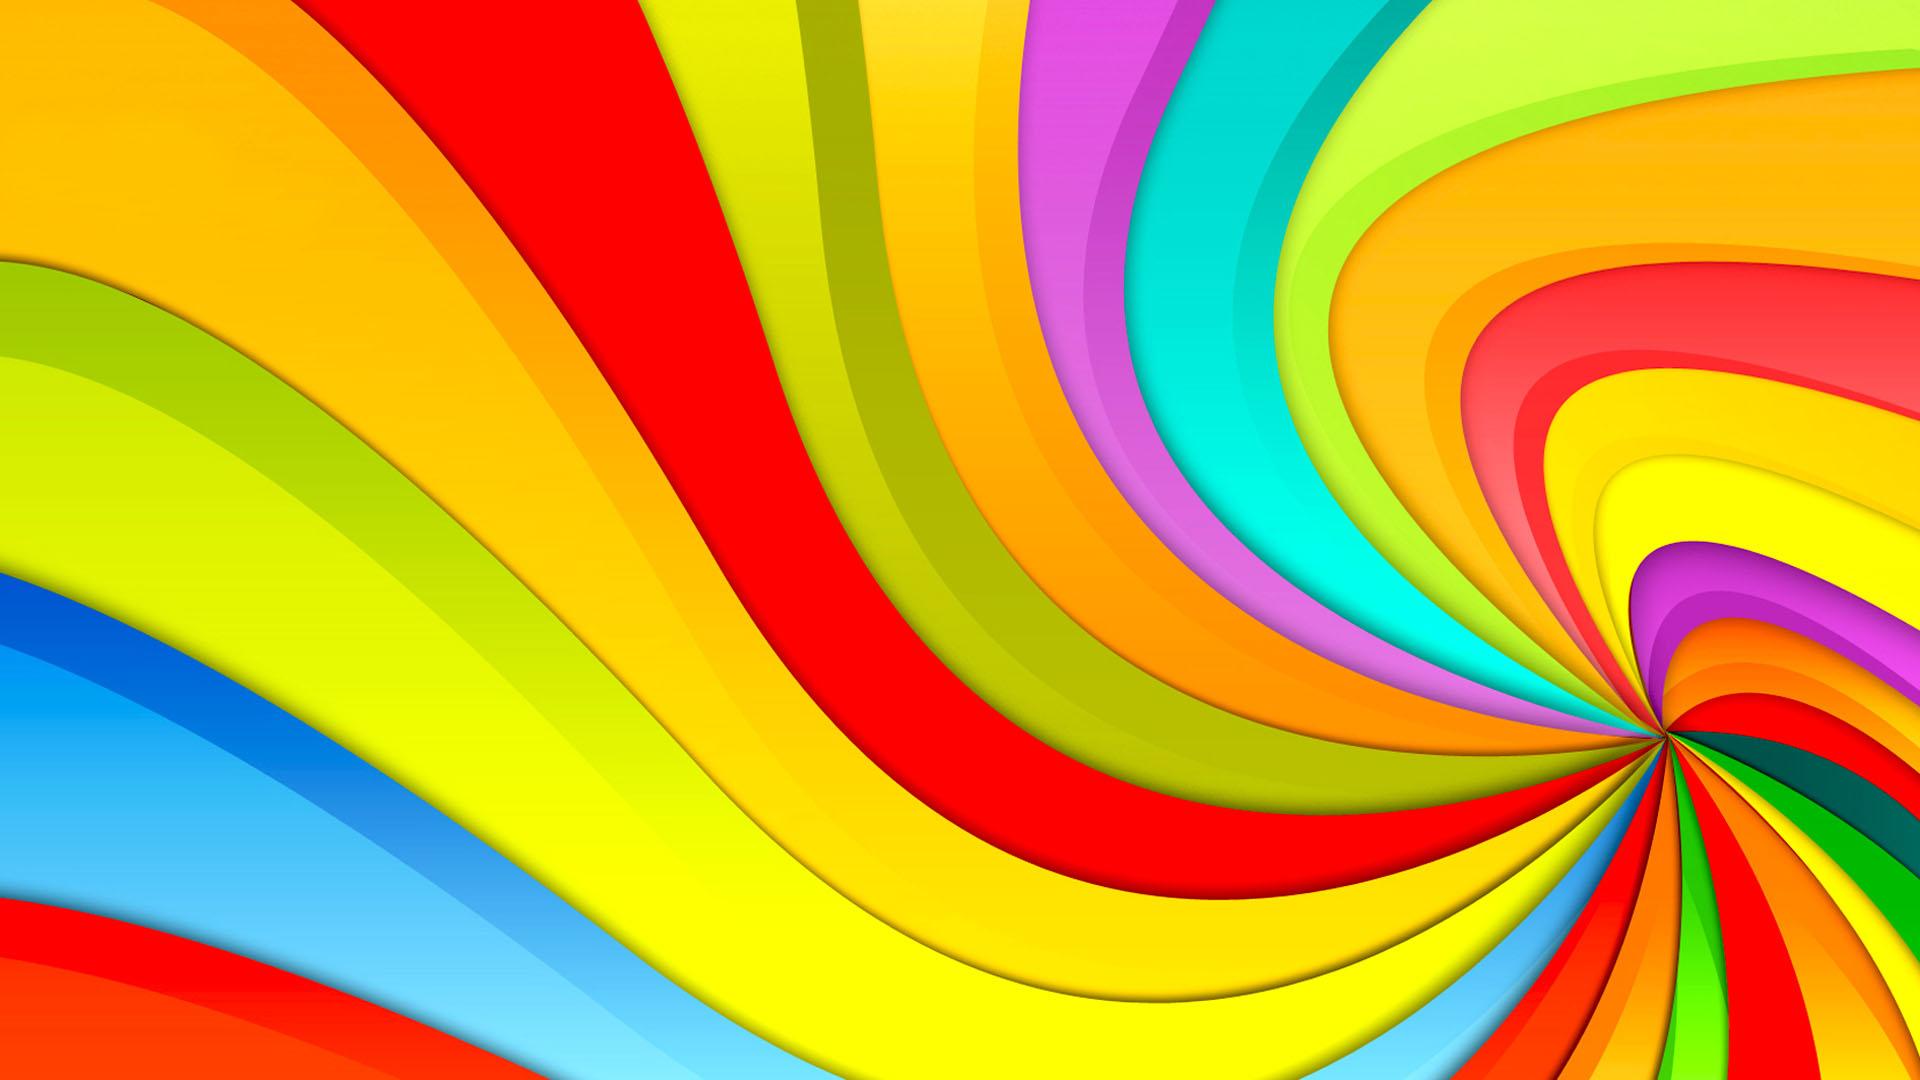 Color Rotation Wallpaper Wallpaper WallpaperLepi 1920x1080